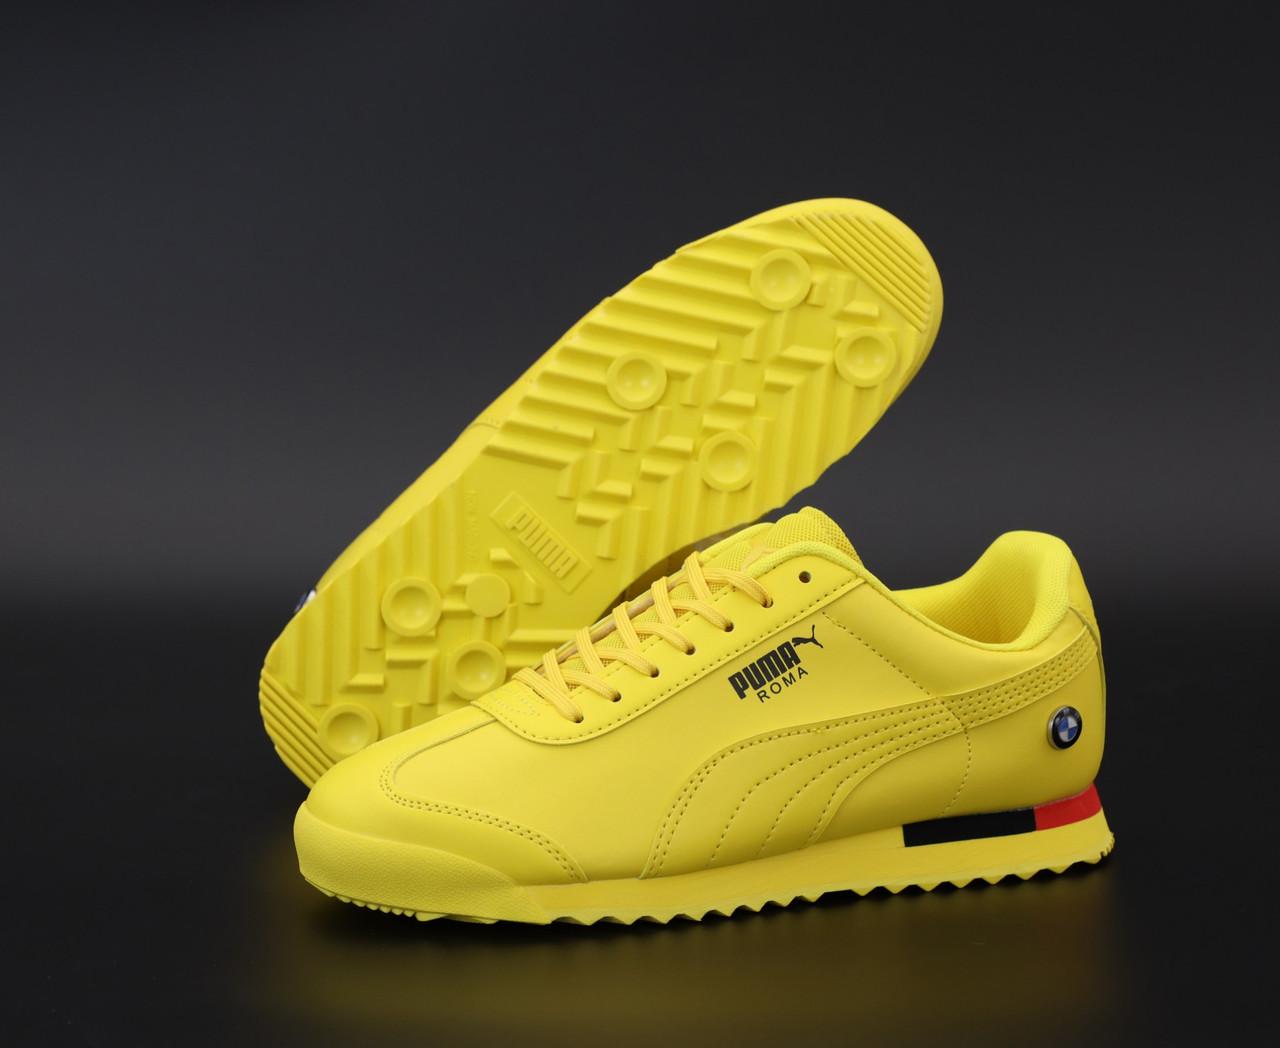 Мужские кроссовки Puma Roma BMW. Yellow. ТОП Реплика ААА класса.